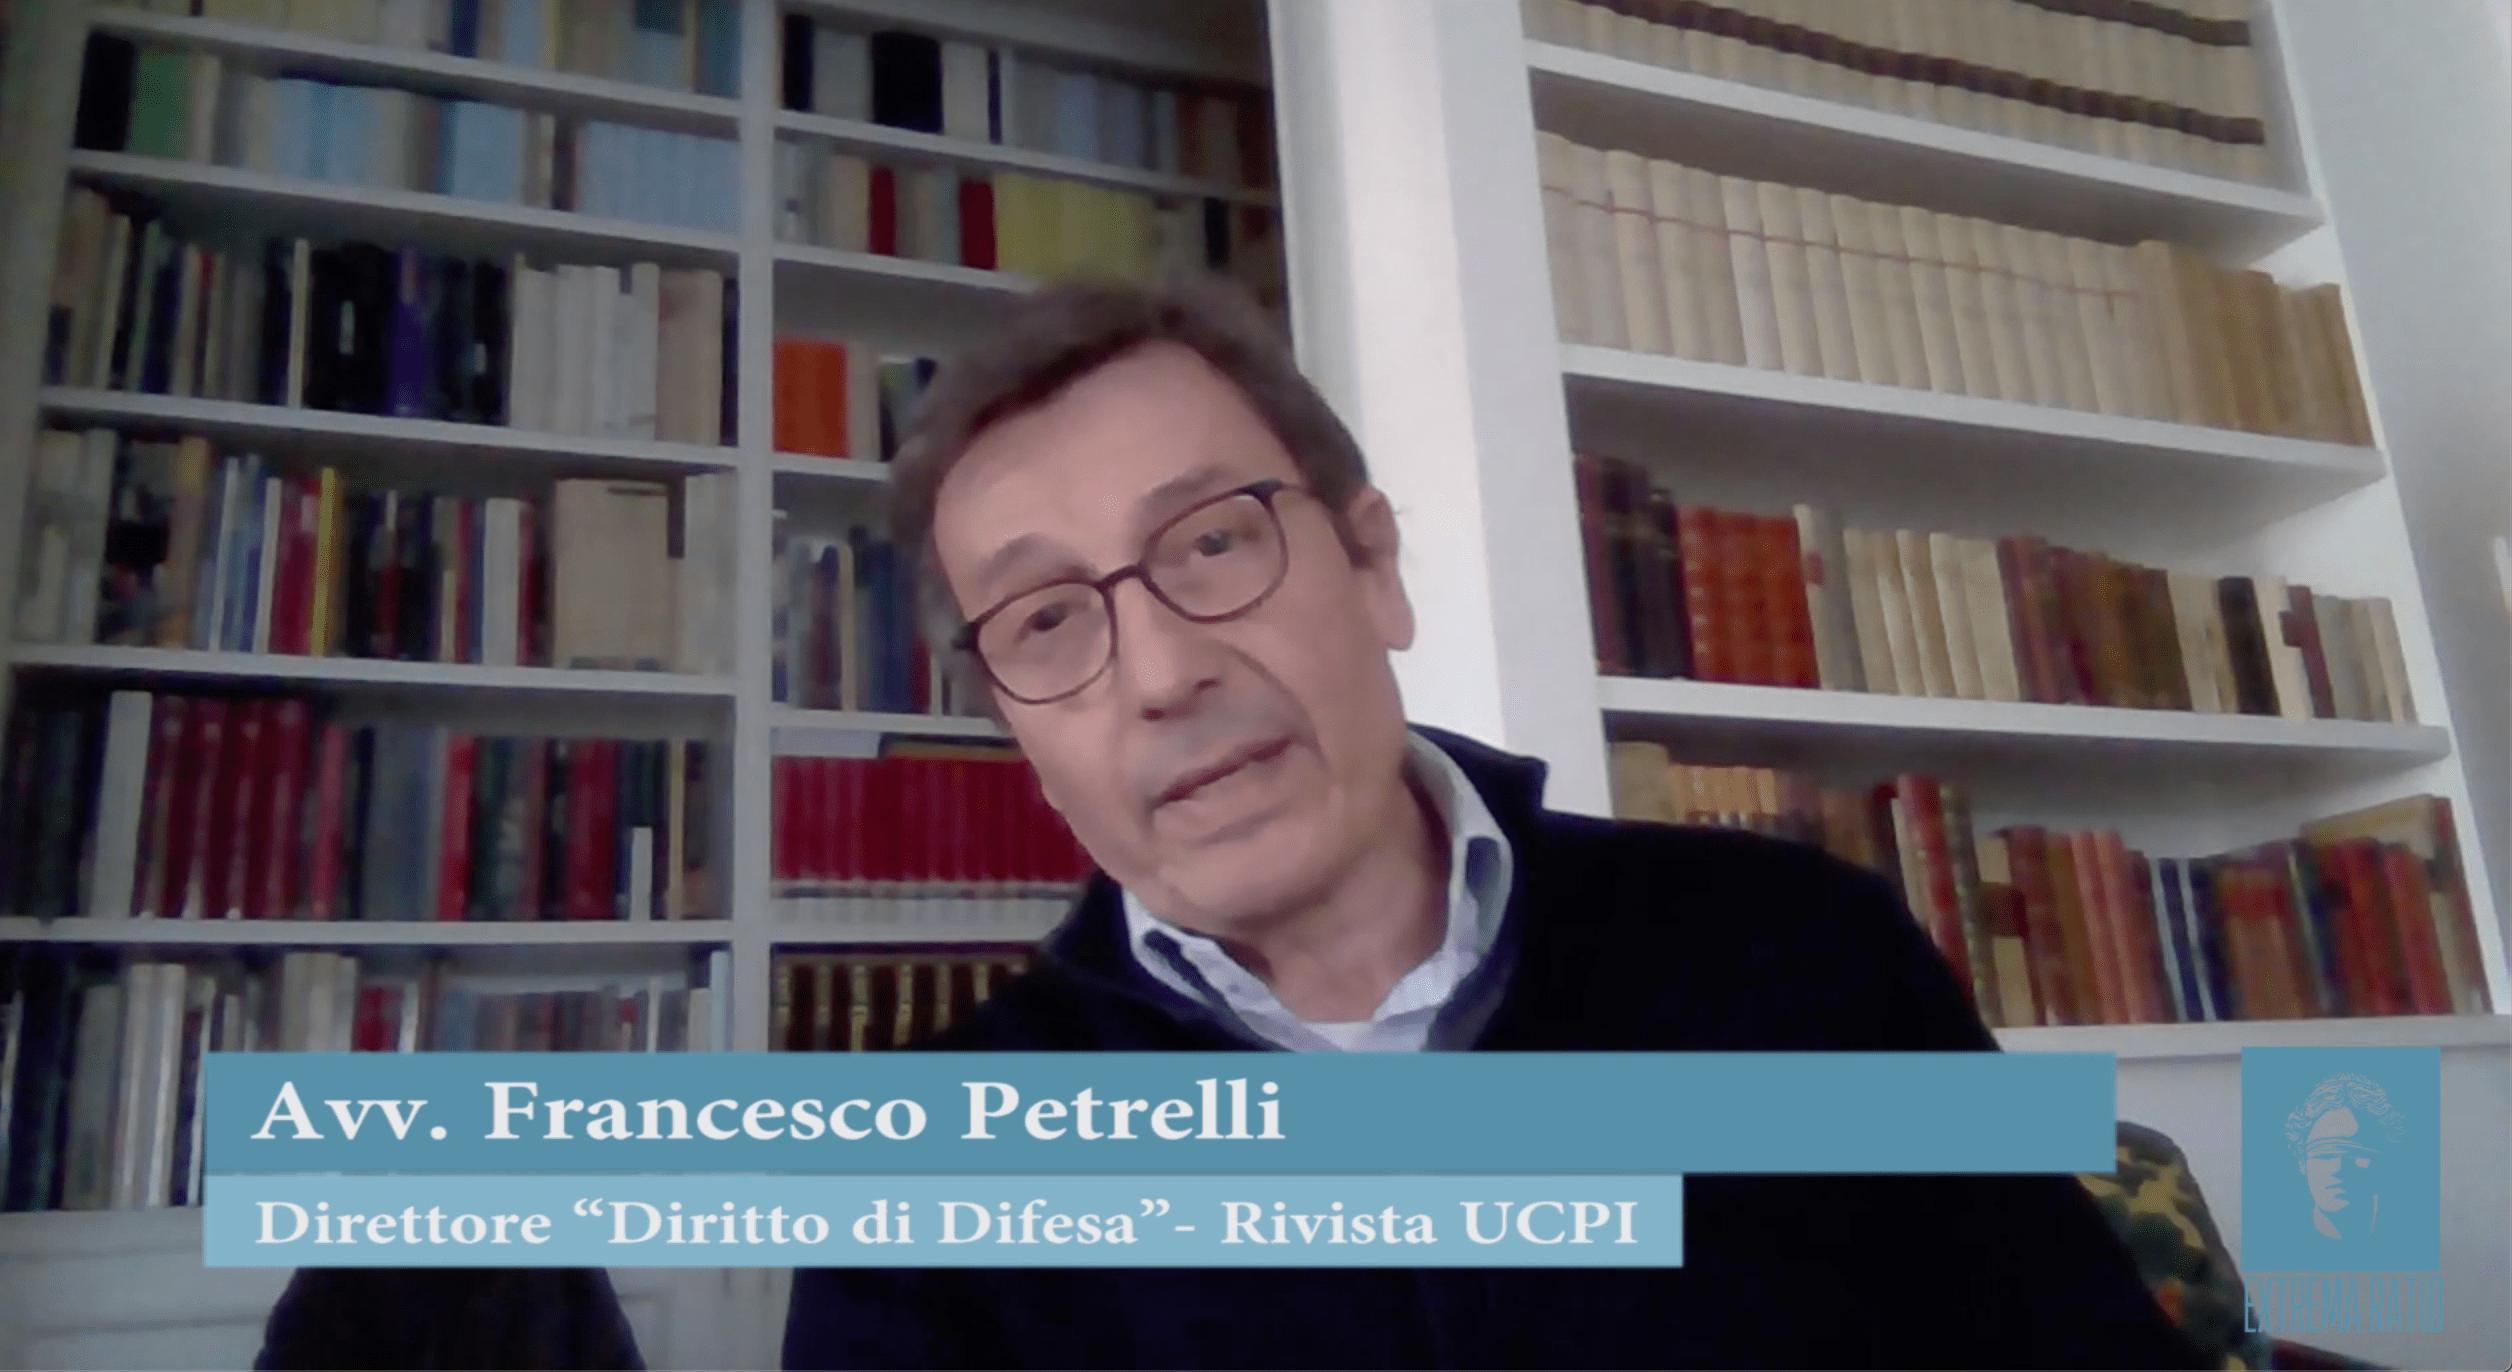 BREVI CONSIGLI DI LETTURA – DI FRANCESCO PETRELLI